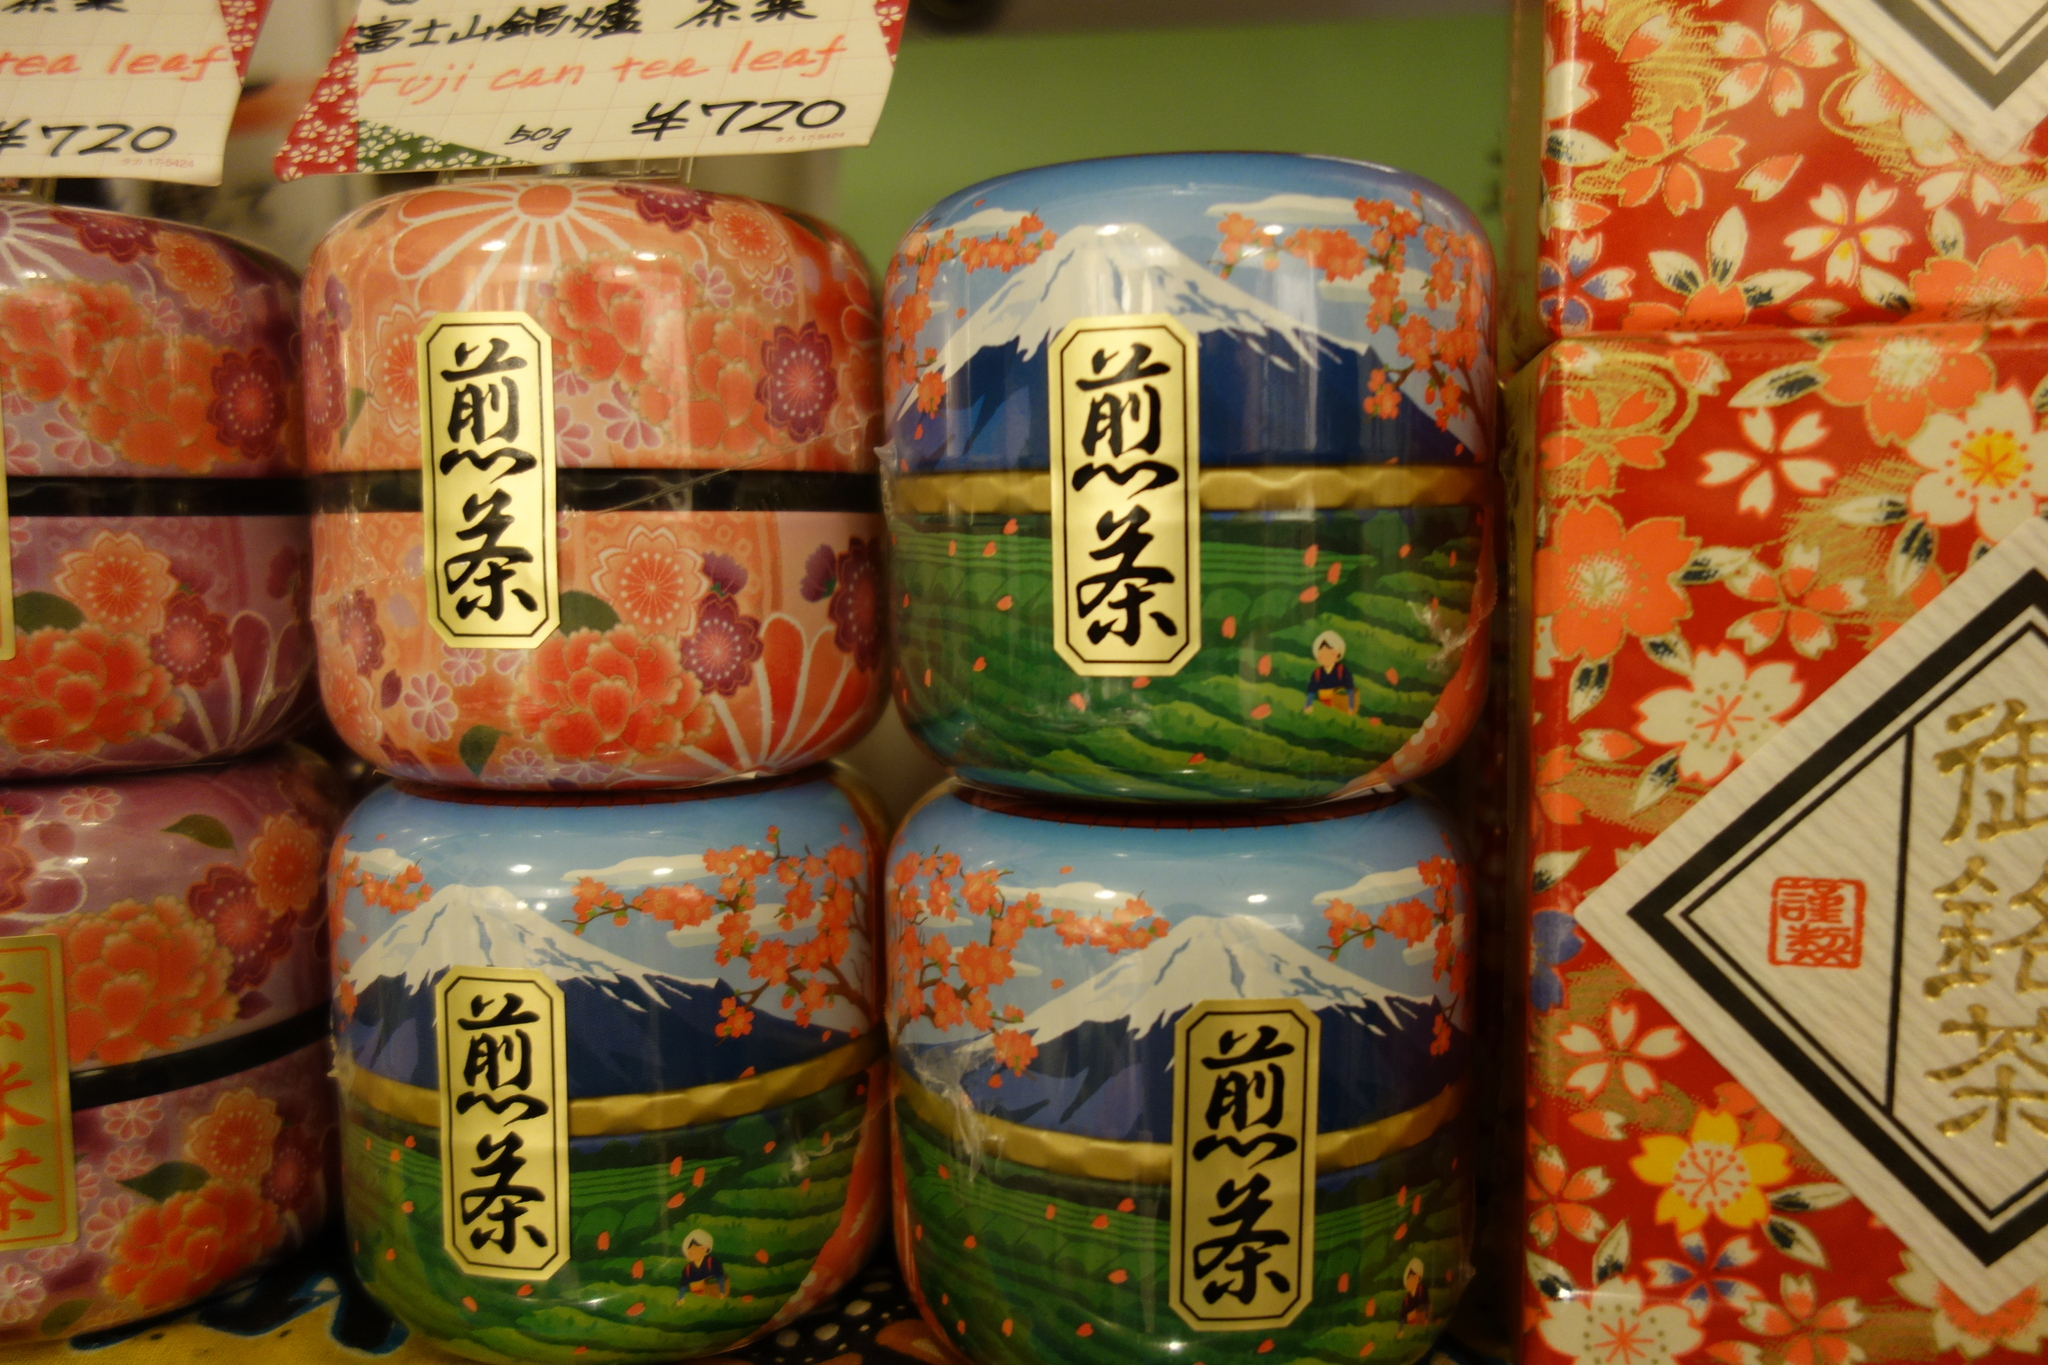 http://www.asakusaminatoya.com/wp-content/uploads/2016/10/DSC00104.jpg